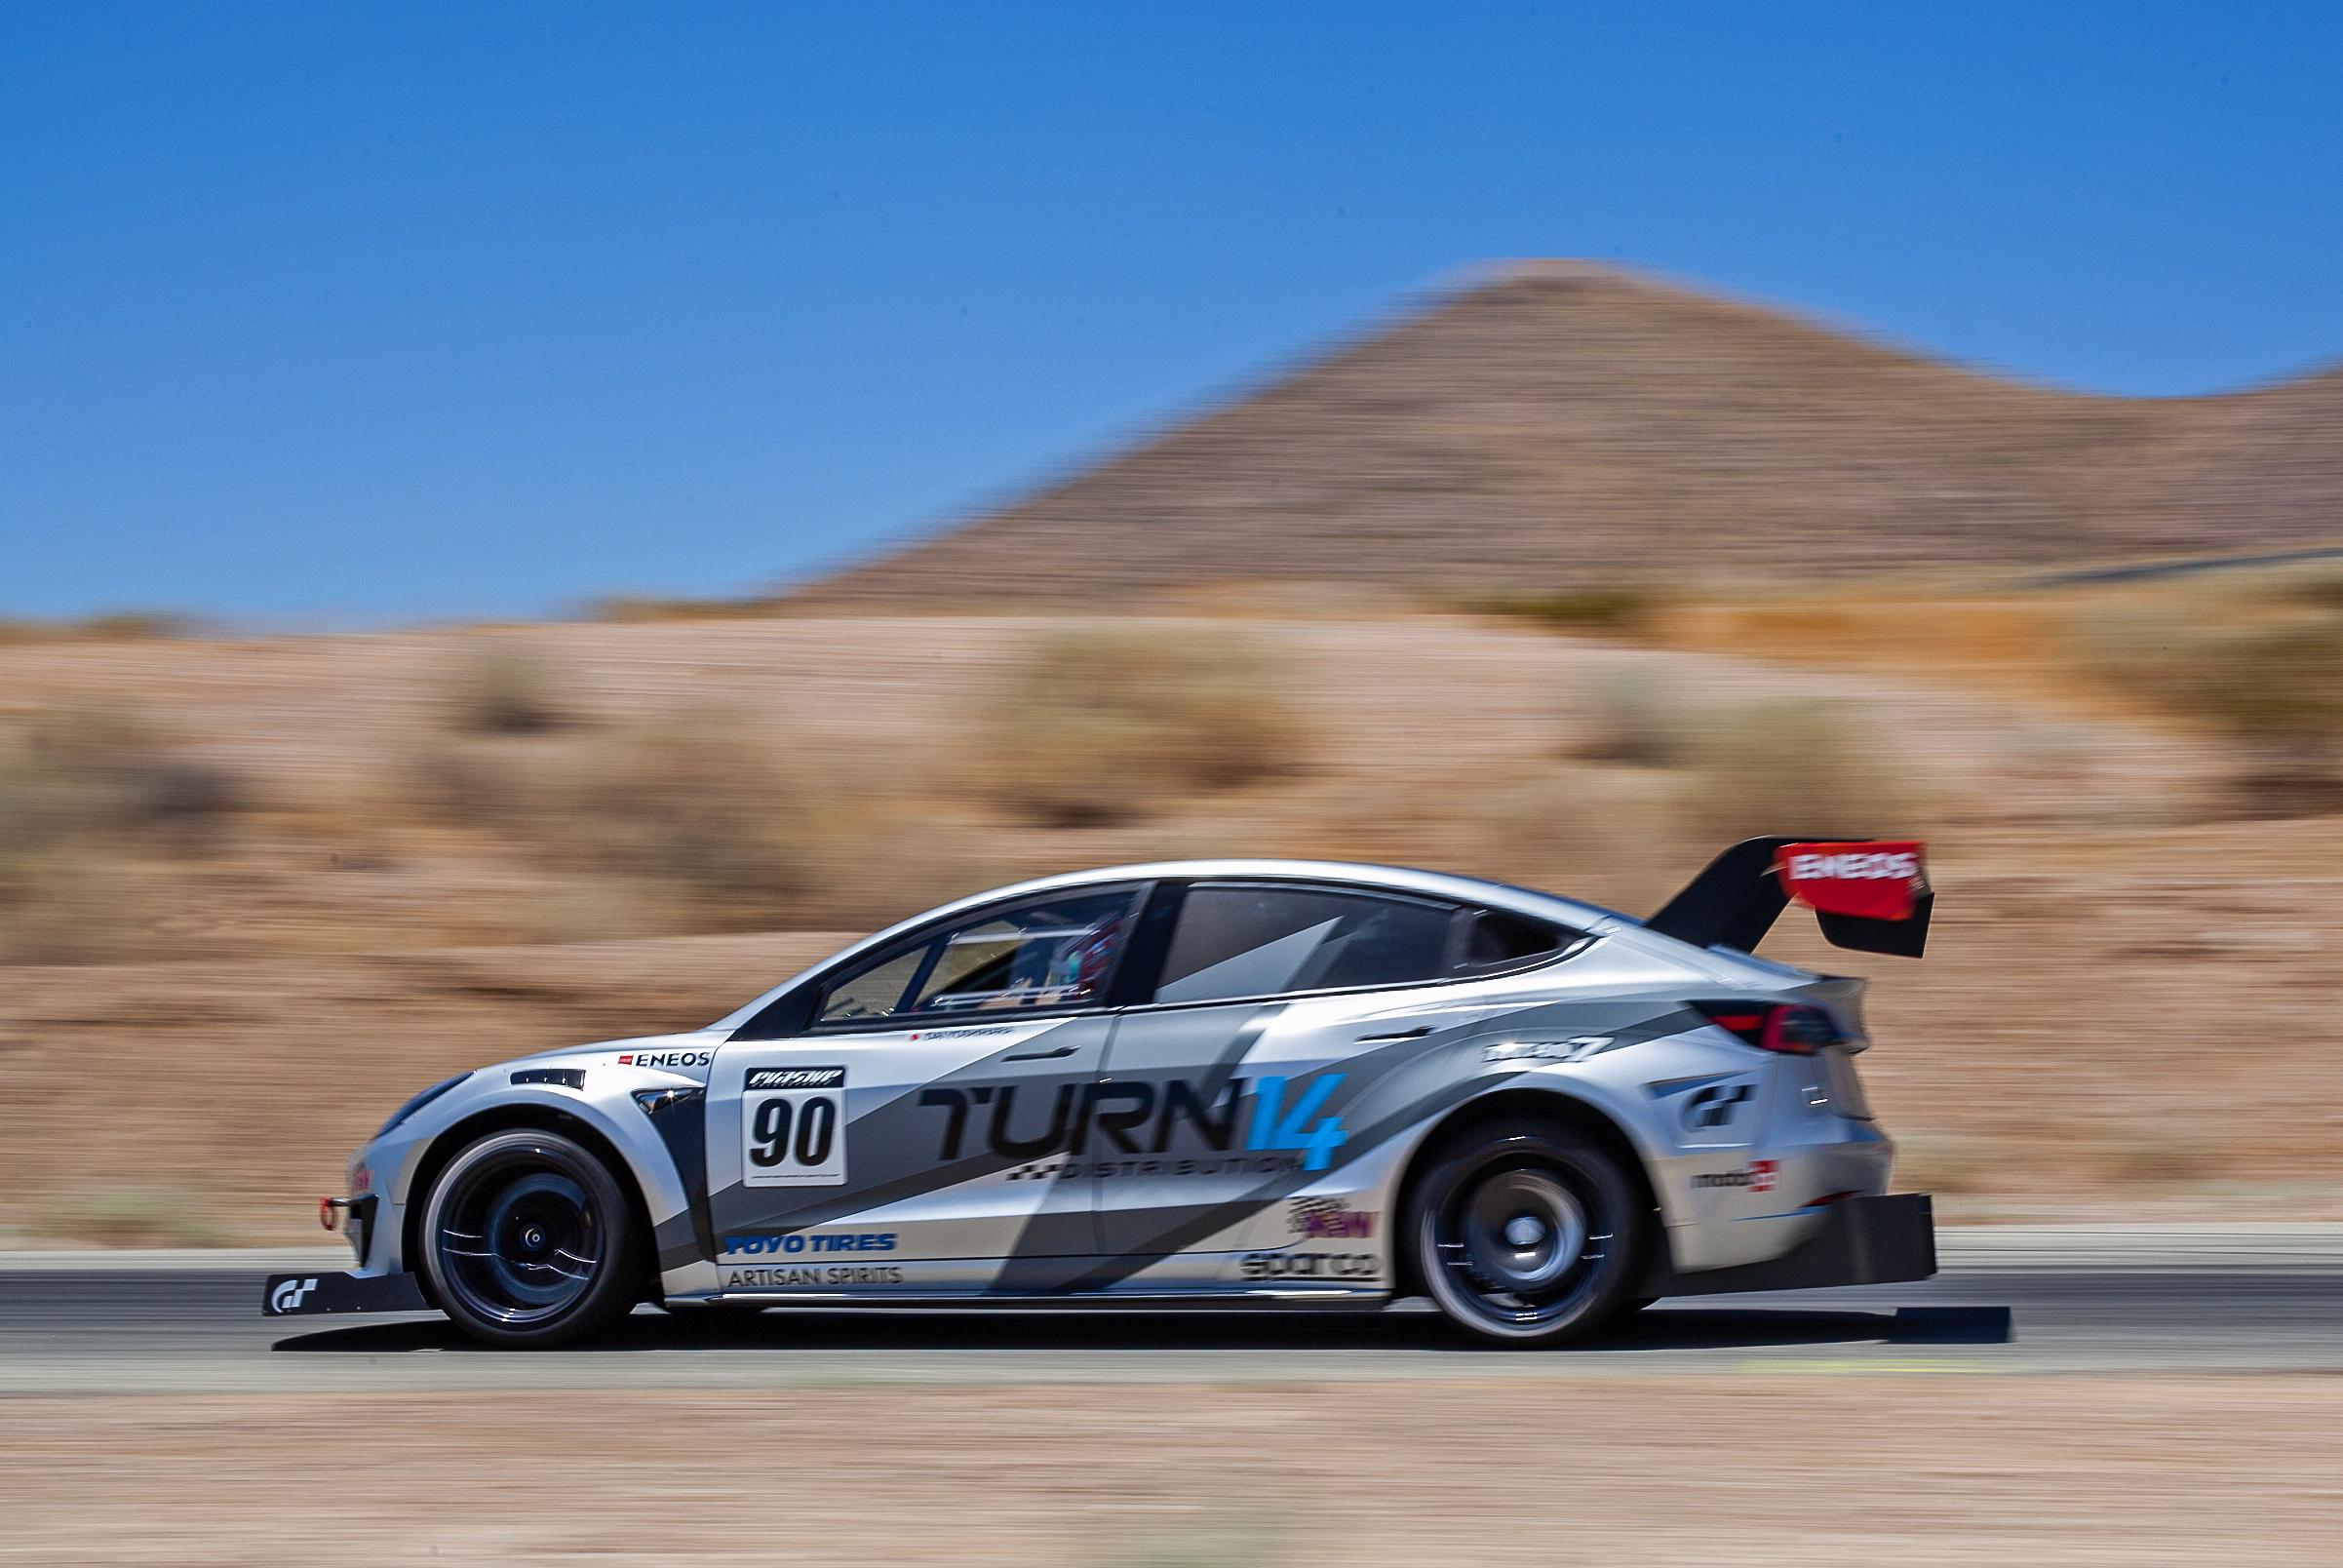 Turn 14 Distribution / Toyo Tires / ENEOS / Evasive Motorsports Tesla Model 3 Pikes Peak race car captured during pre-reace testing